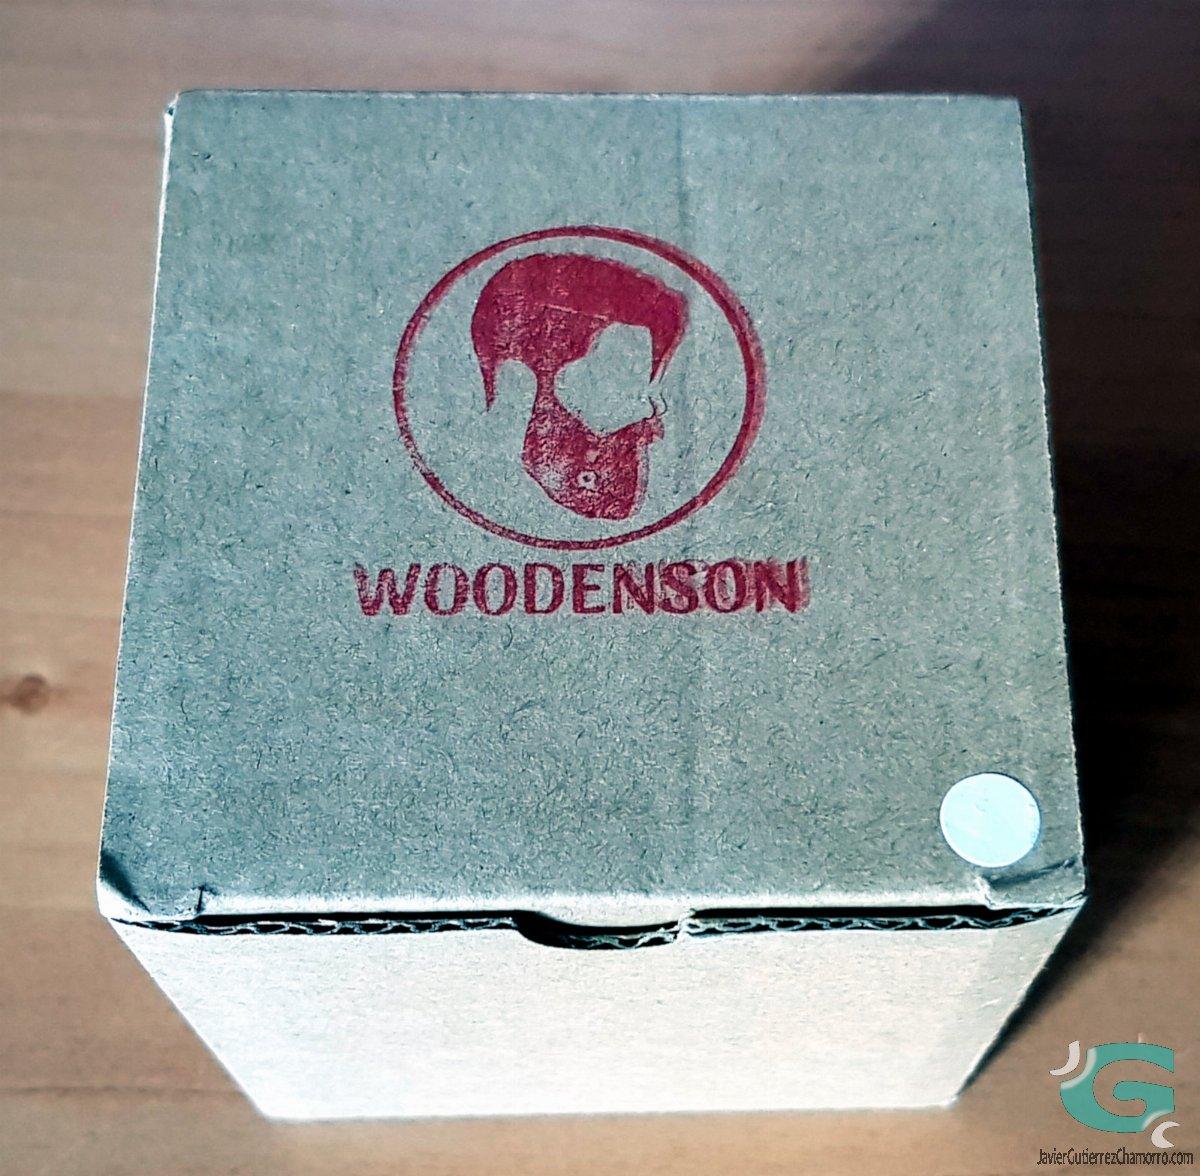 e661c5c06bf0 Los relojes Woodenson de Aliexpress